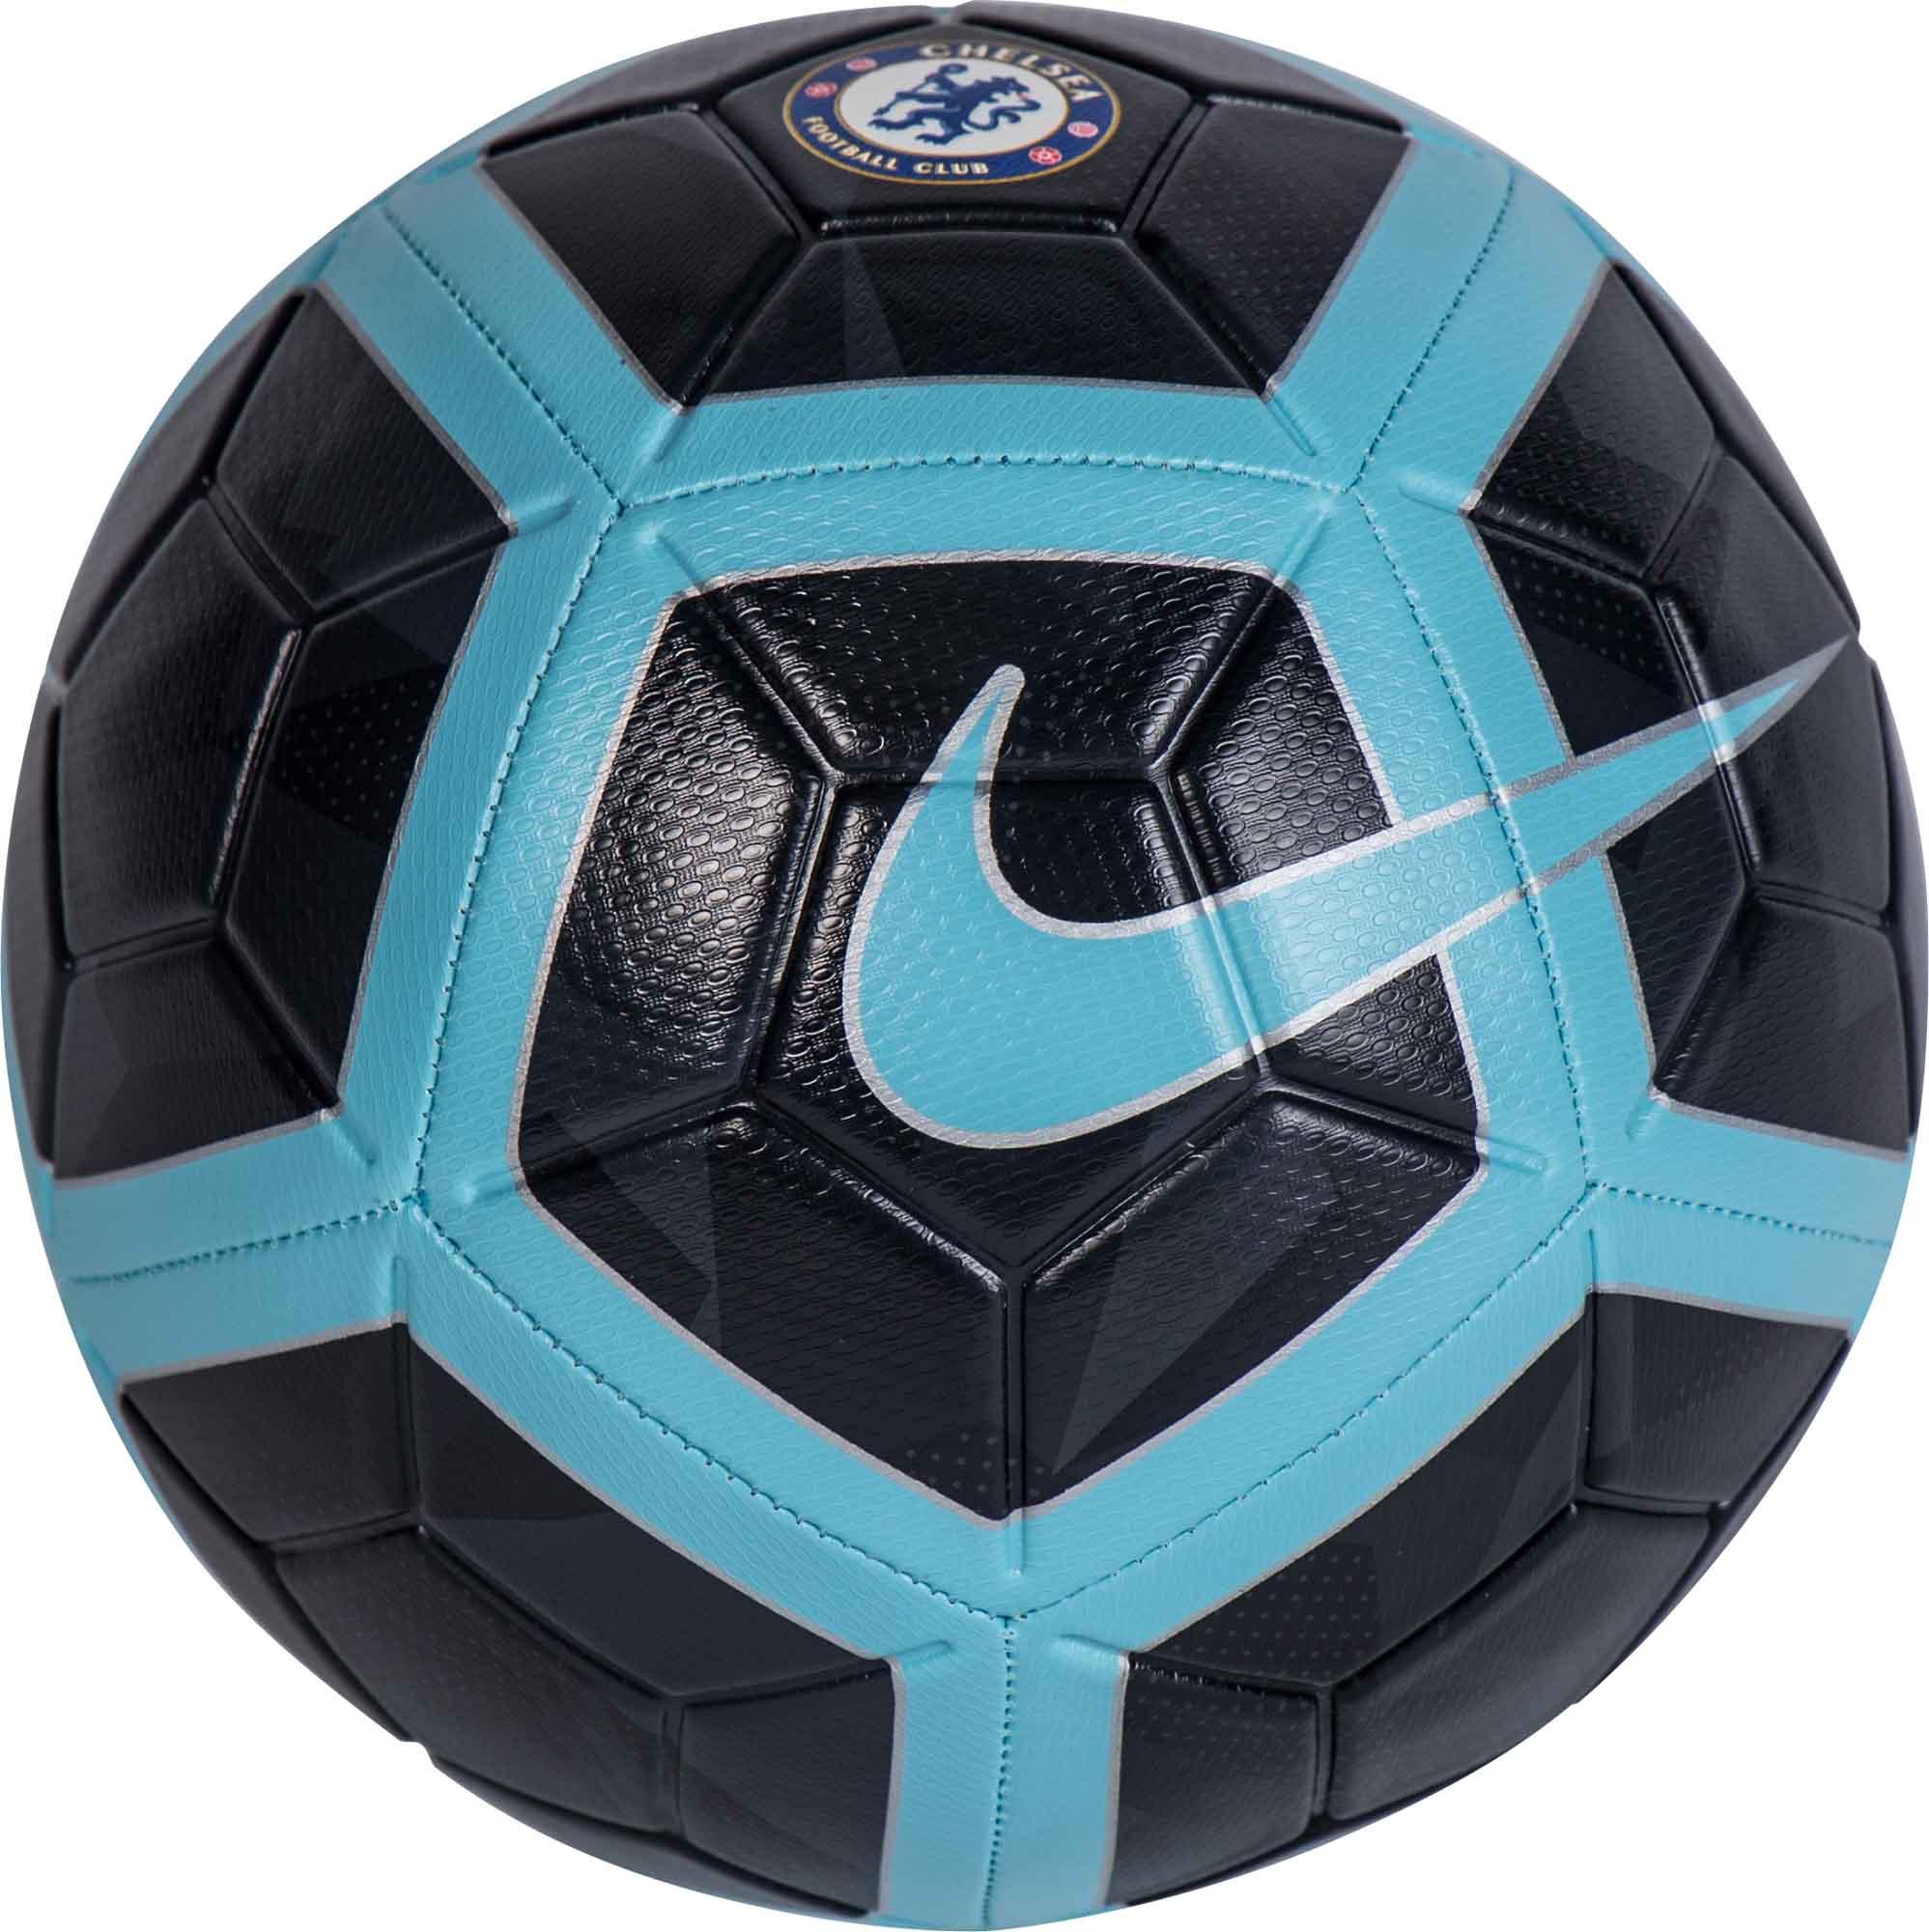 Fotbalový míč Nike Strike FC Chelsea  bfbc4f1b5e